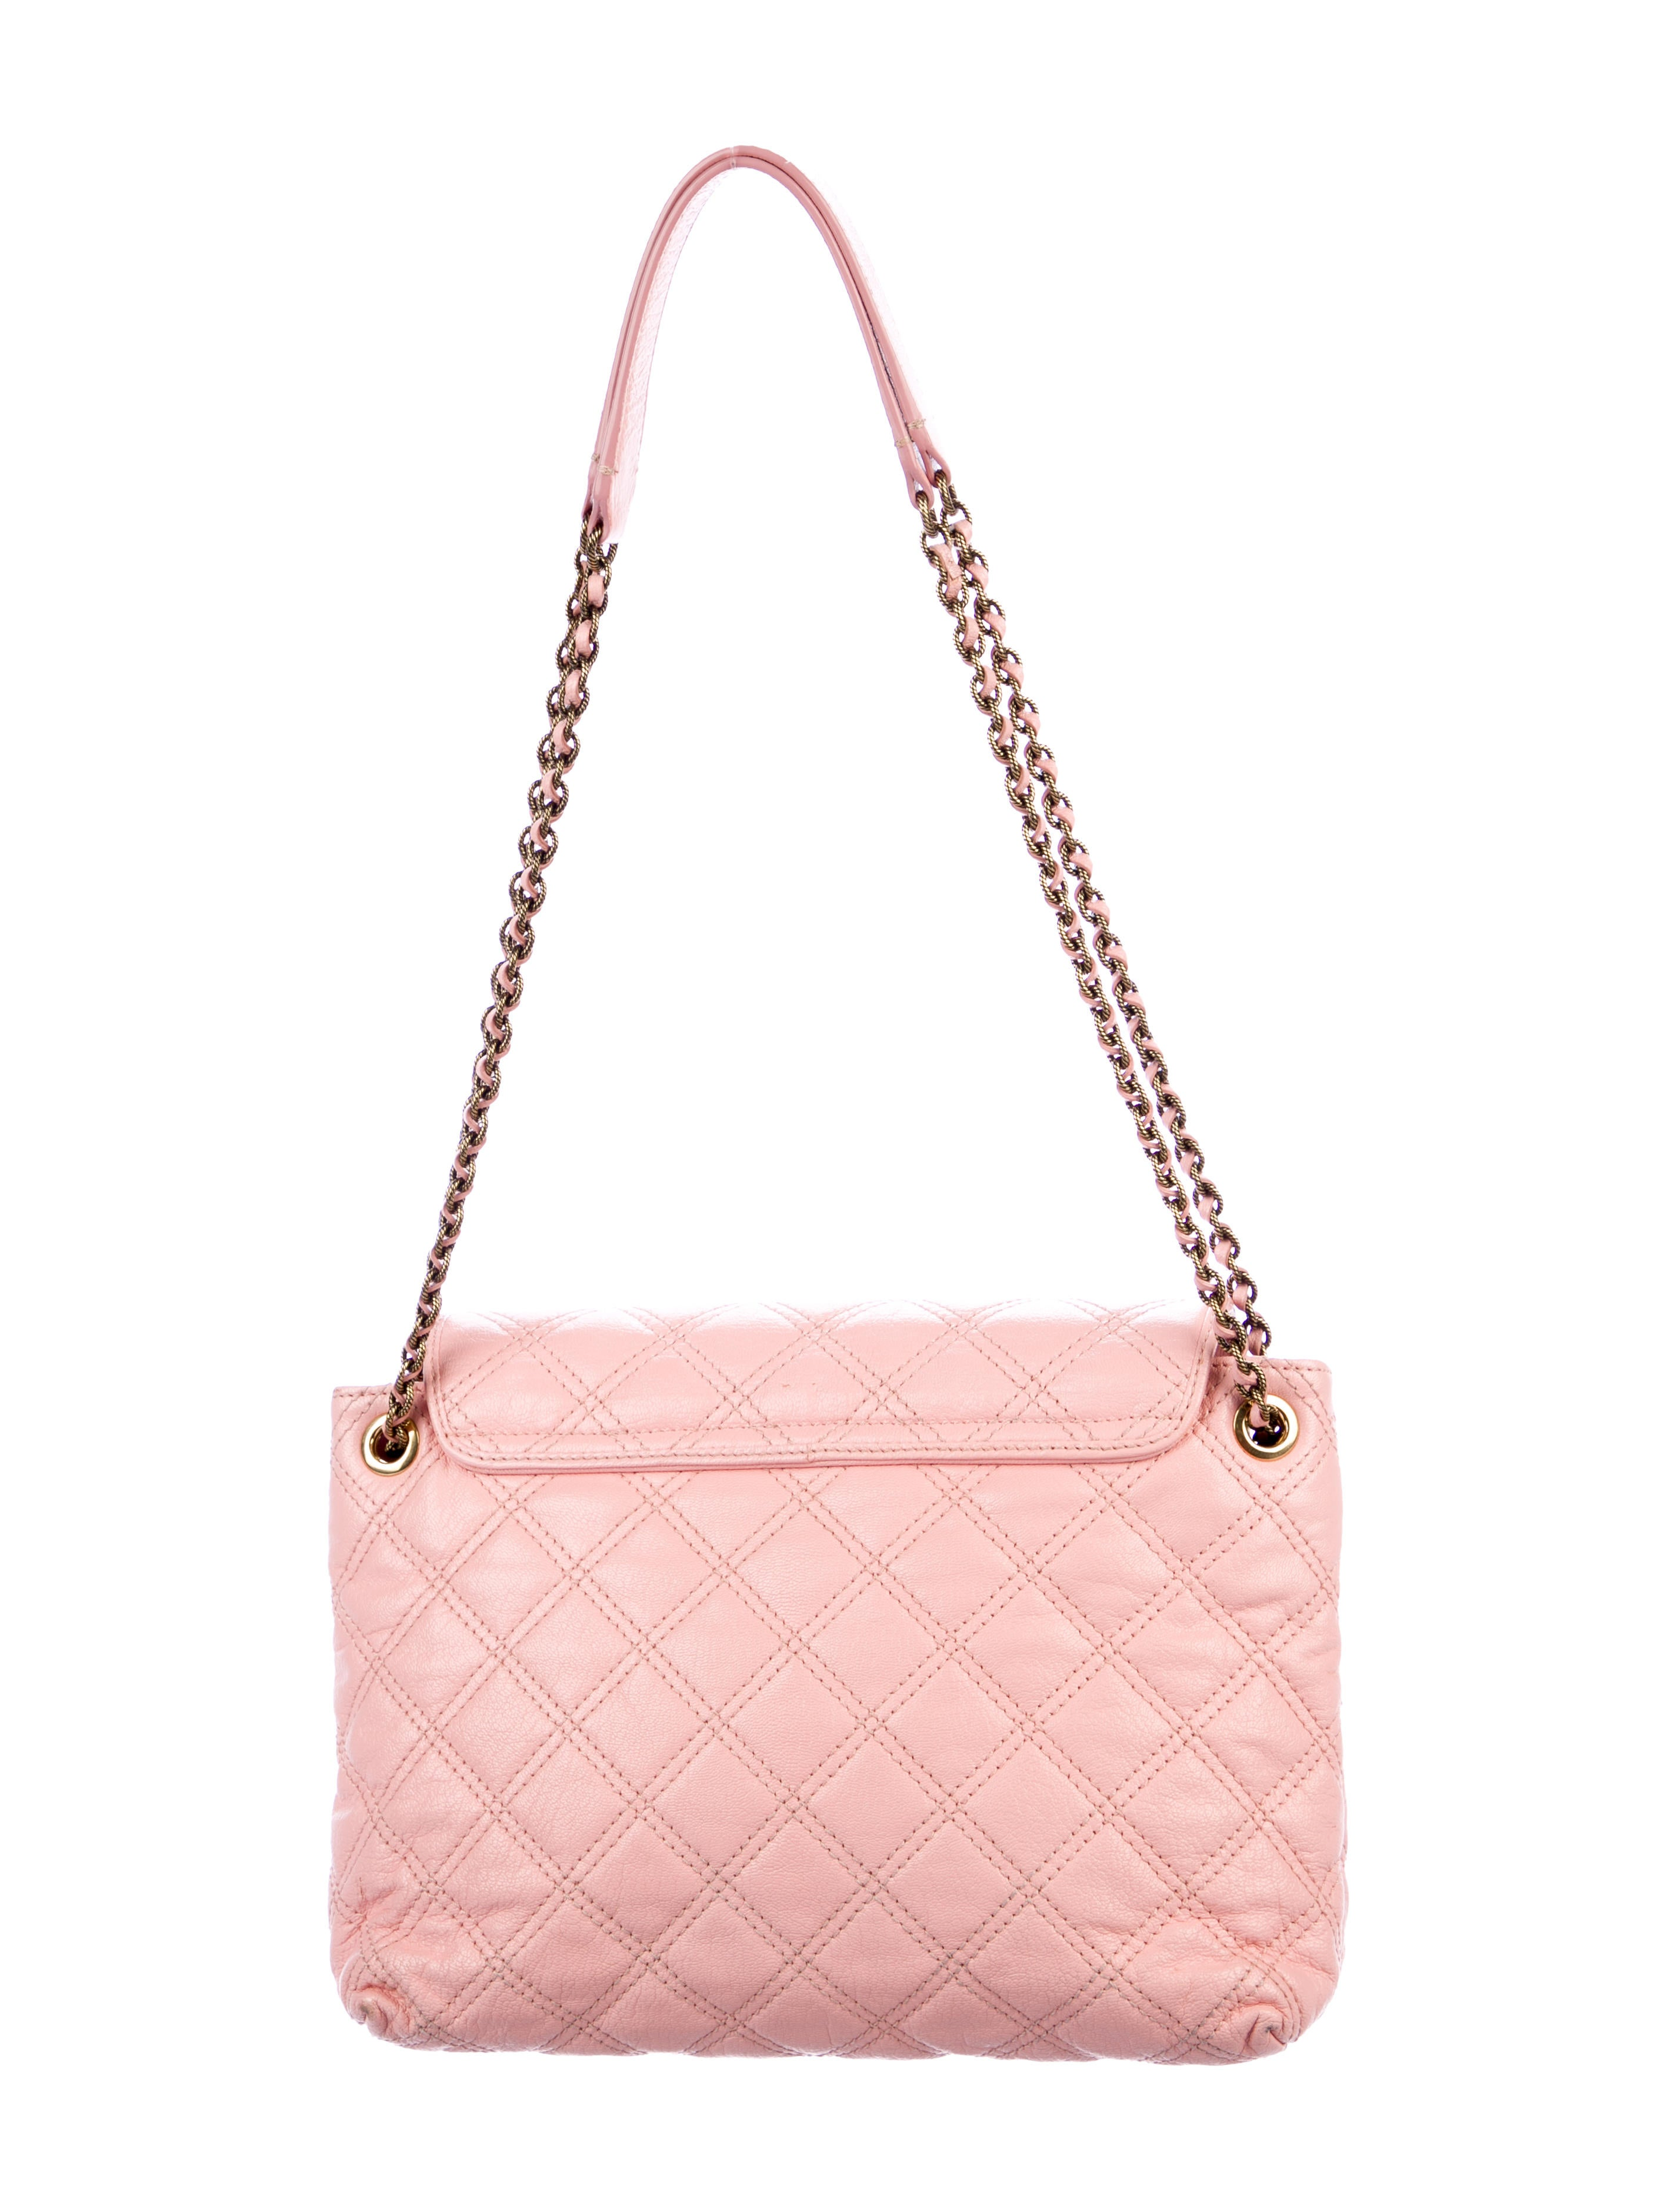 c8b5f0a42f0d Marc Jacobs Quilted Xl Single Shoulder Bag - Best Quilt Grafimage.co